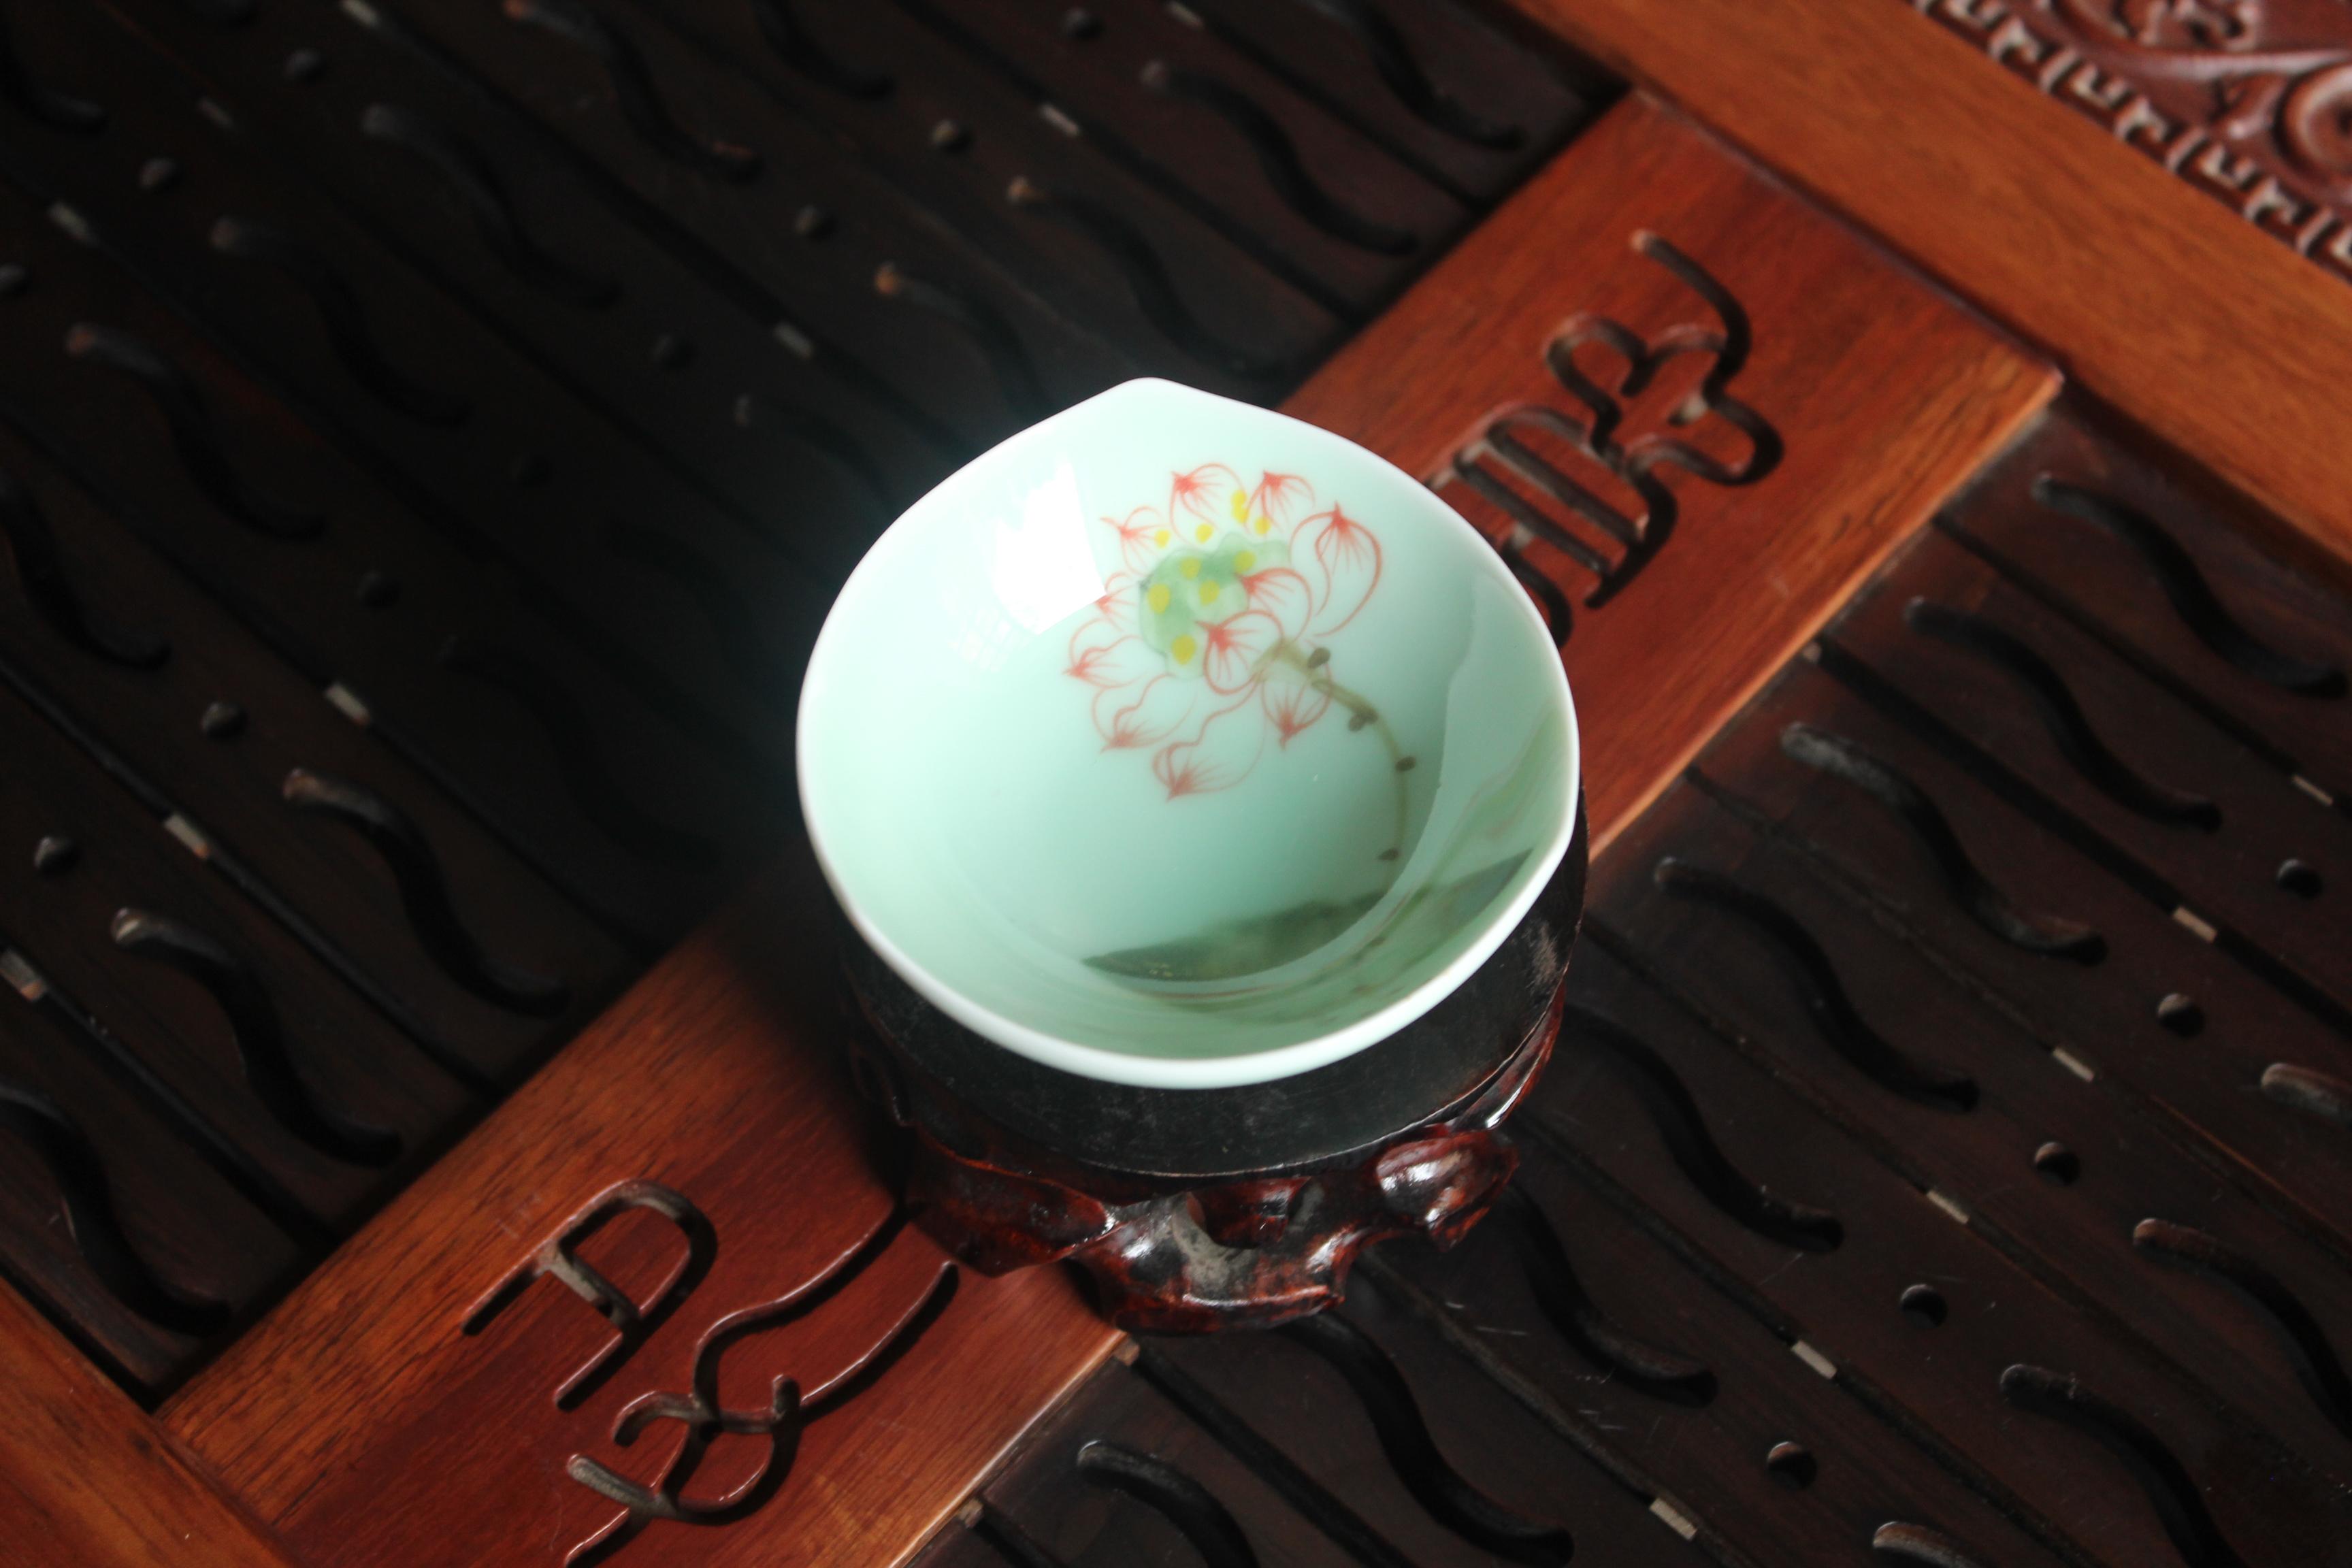 Pin on Romance Of The Three Kingdoms Characters |Chen Jianbin Cao Cao